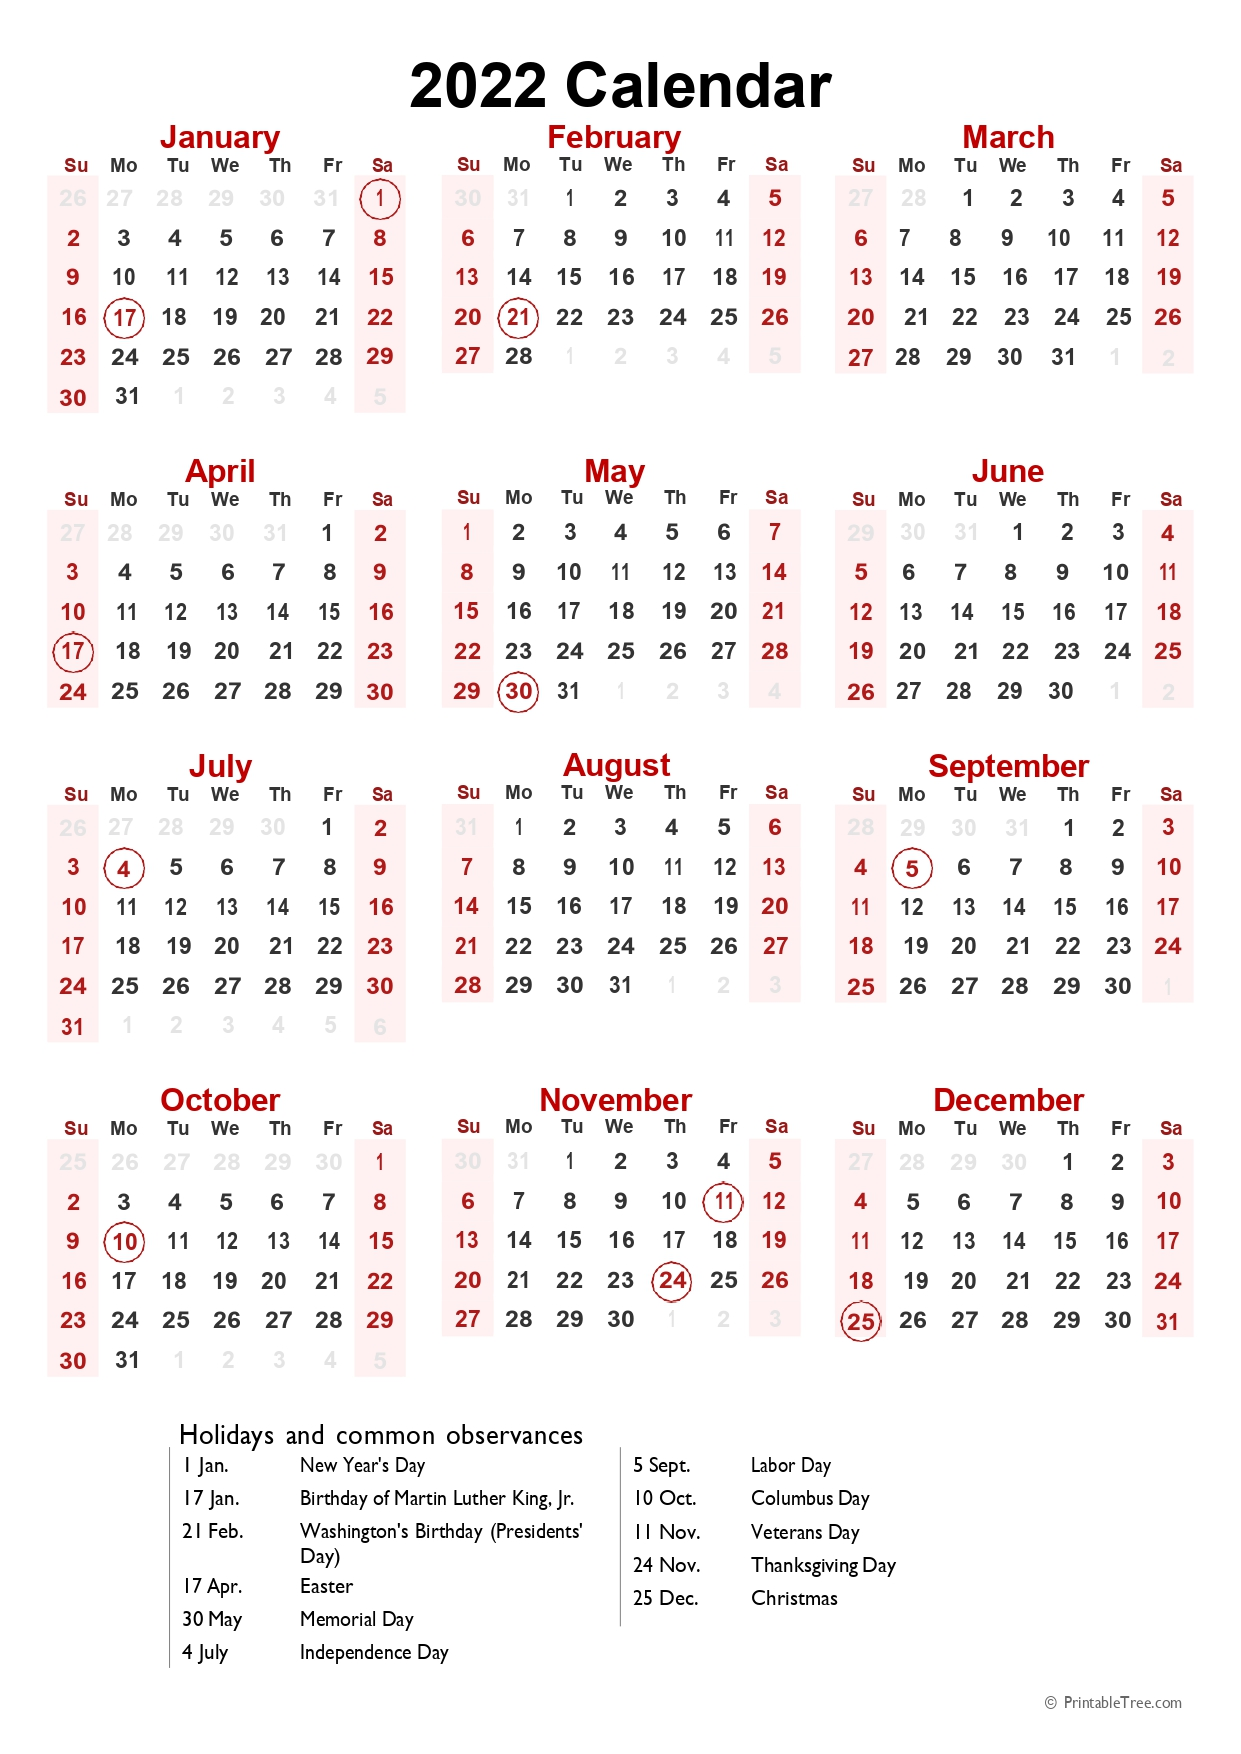 2022 Calendar with US holidays Portrait Format